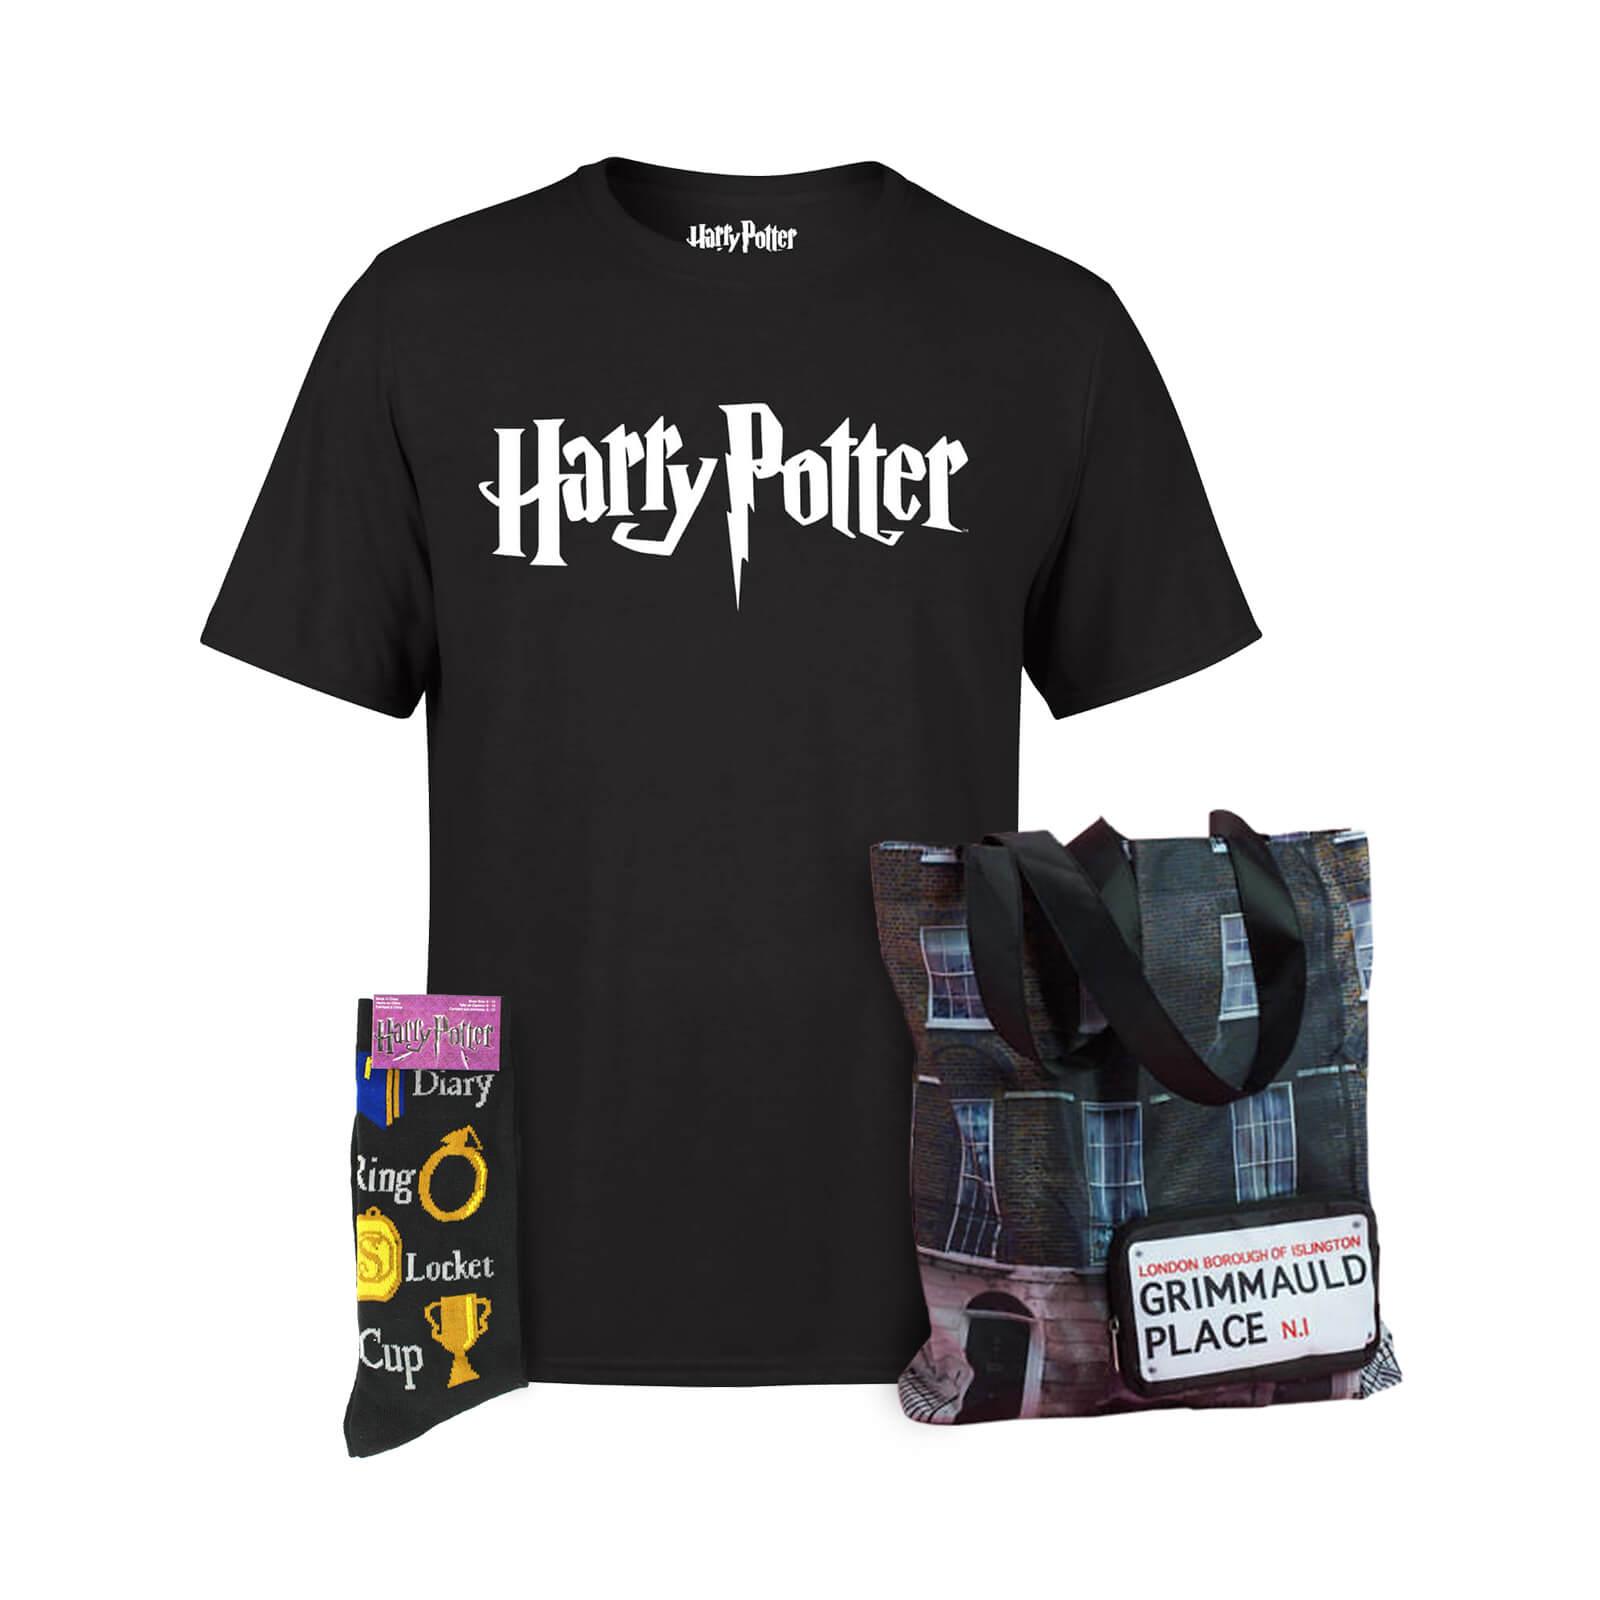 Harry Potter Bundle - Incl. Logo Men's / Women's T-Shirt +  Horcrux Socks + Grimmauld Place Tote Bag £14.99 + 99p  delivery at Zavvi